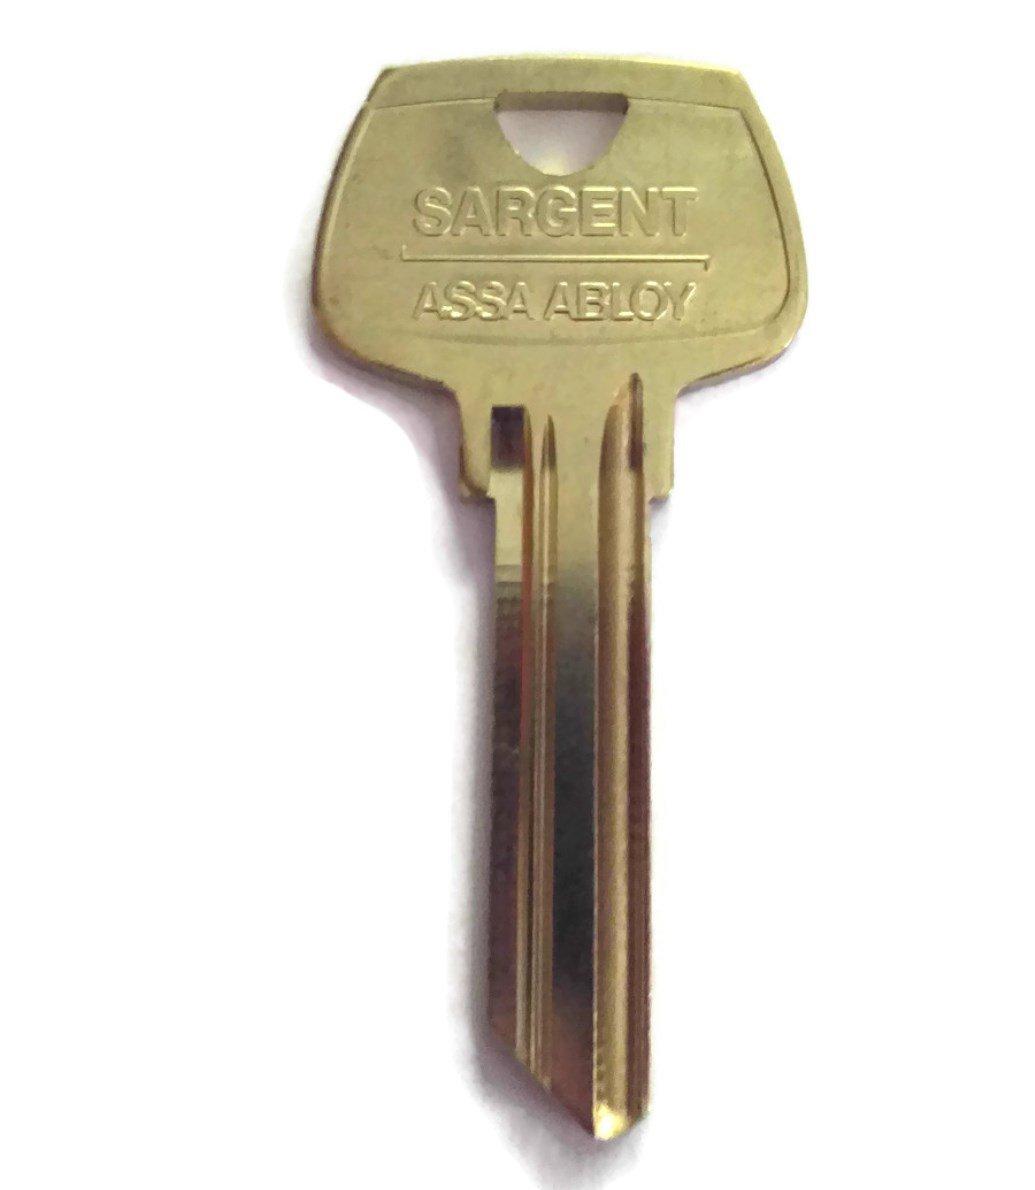 Sargent 6 Pin Key Blank 6270 RM Keyway, Pkg of 10, Factory Original